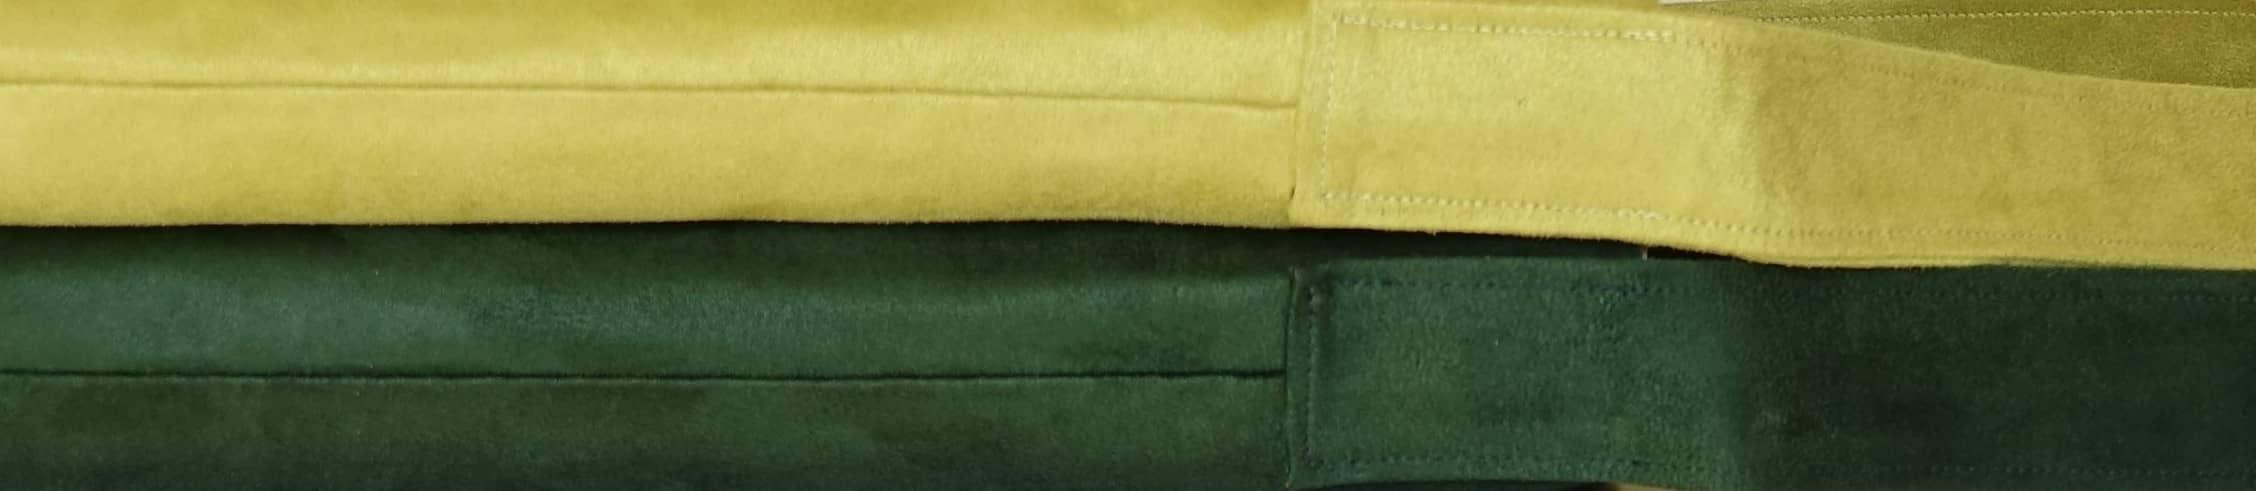 sac hobobag suedine verts aloee